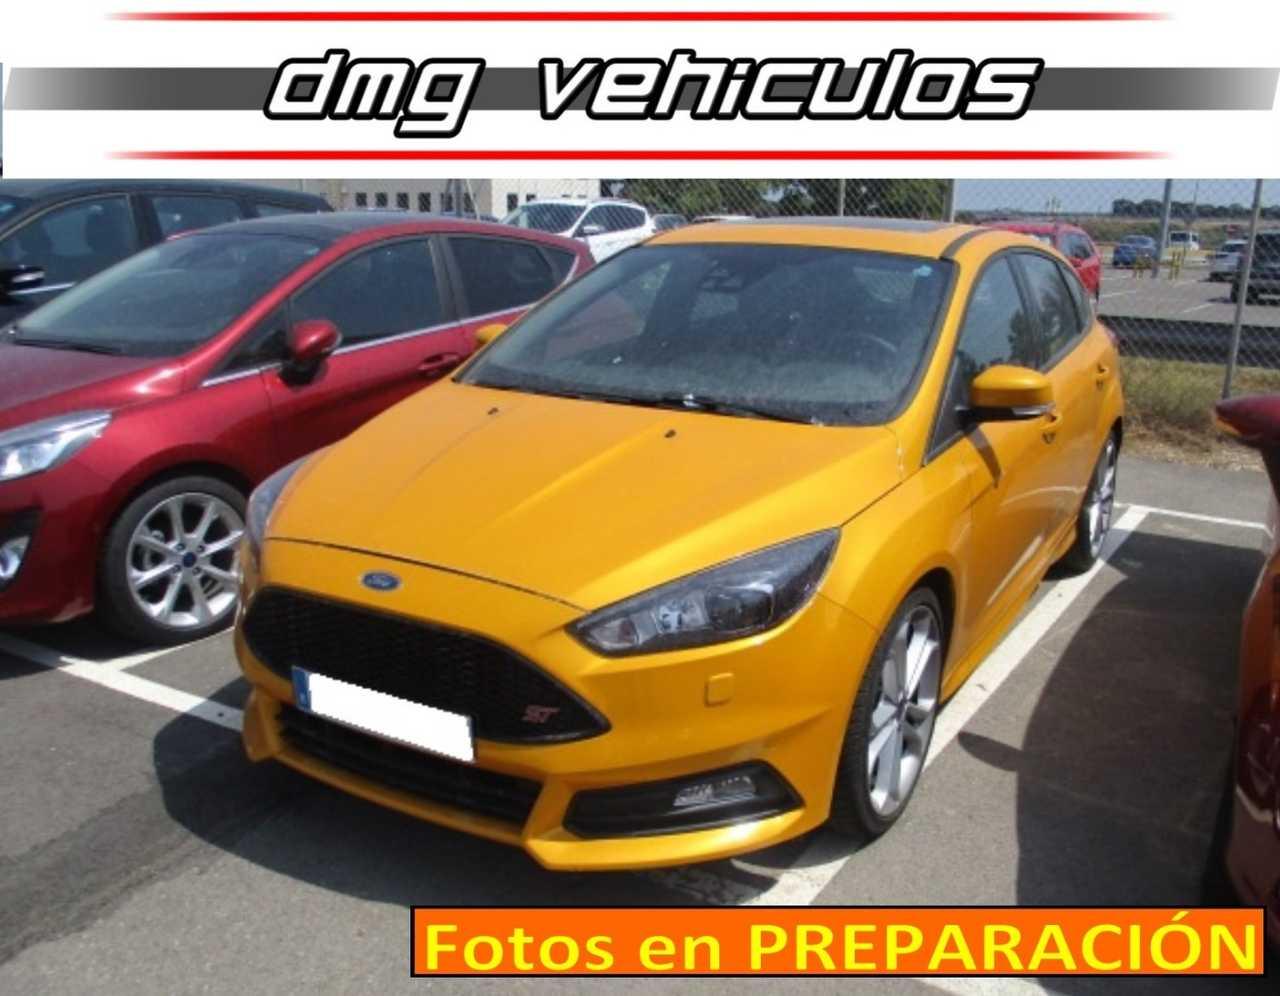 Ford Focus 2.0TDCi ST PowerShift 185Cv 5 puertas   - Foto 1